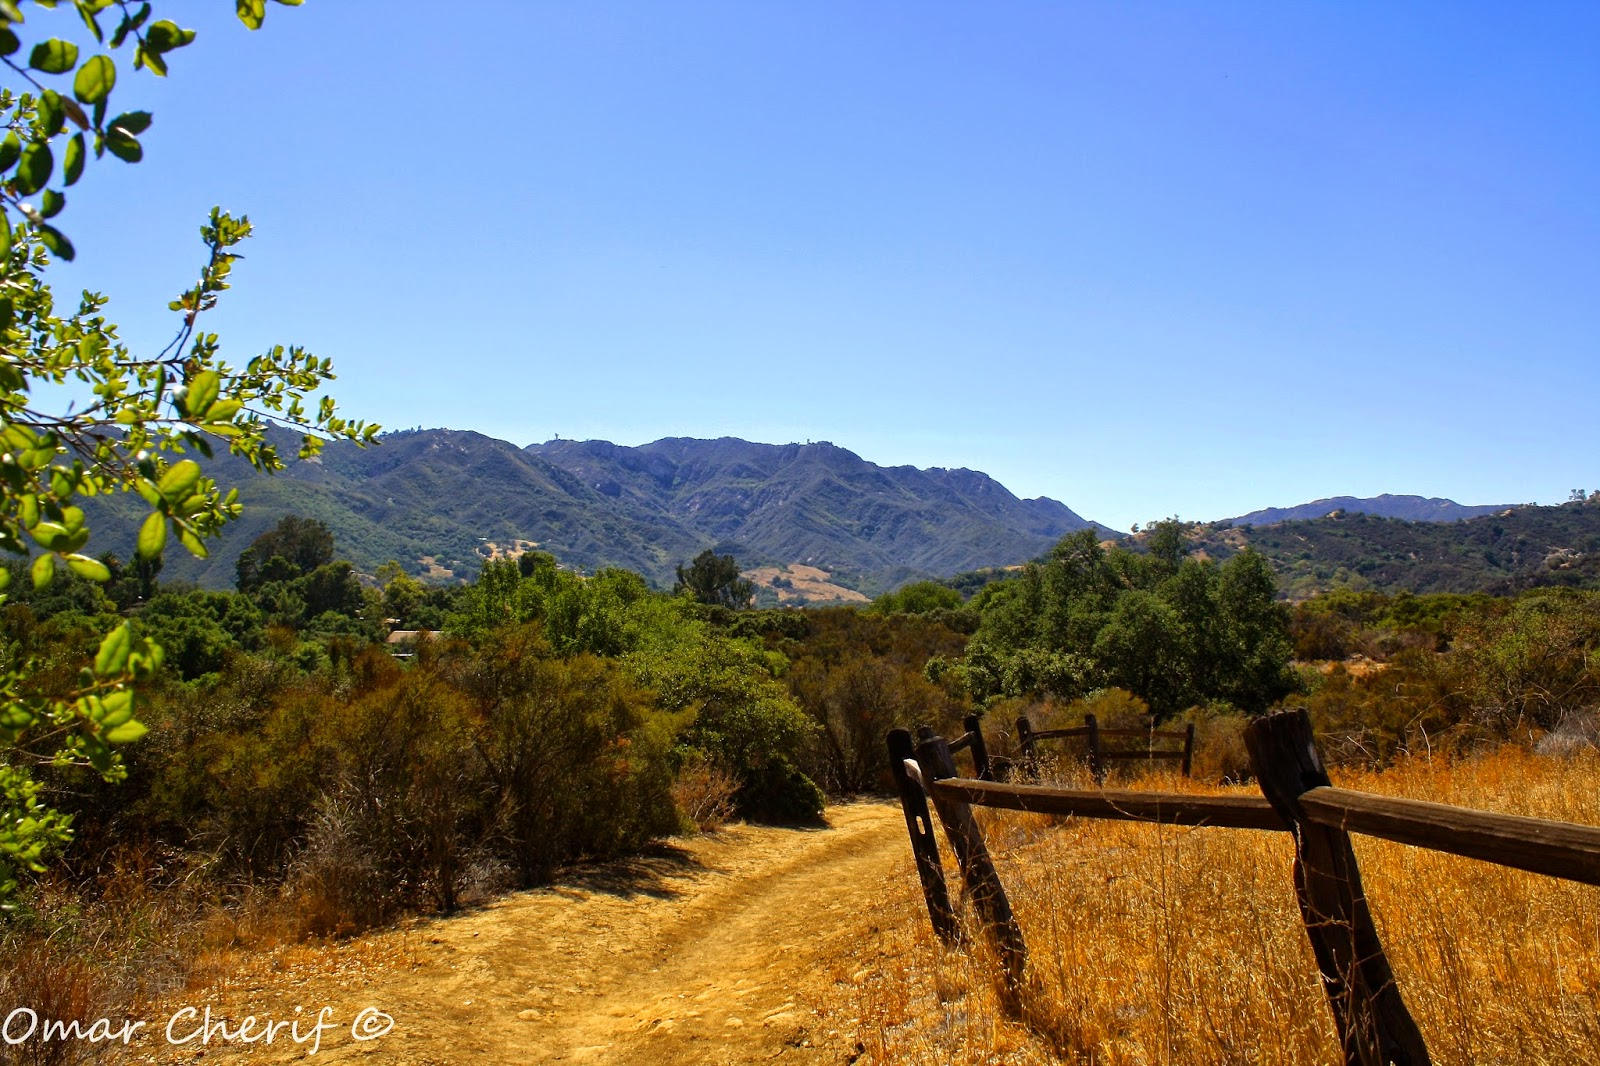 California, USA - 2014